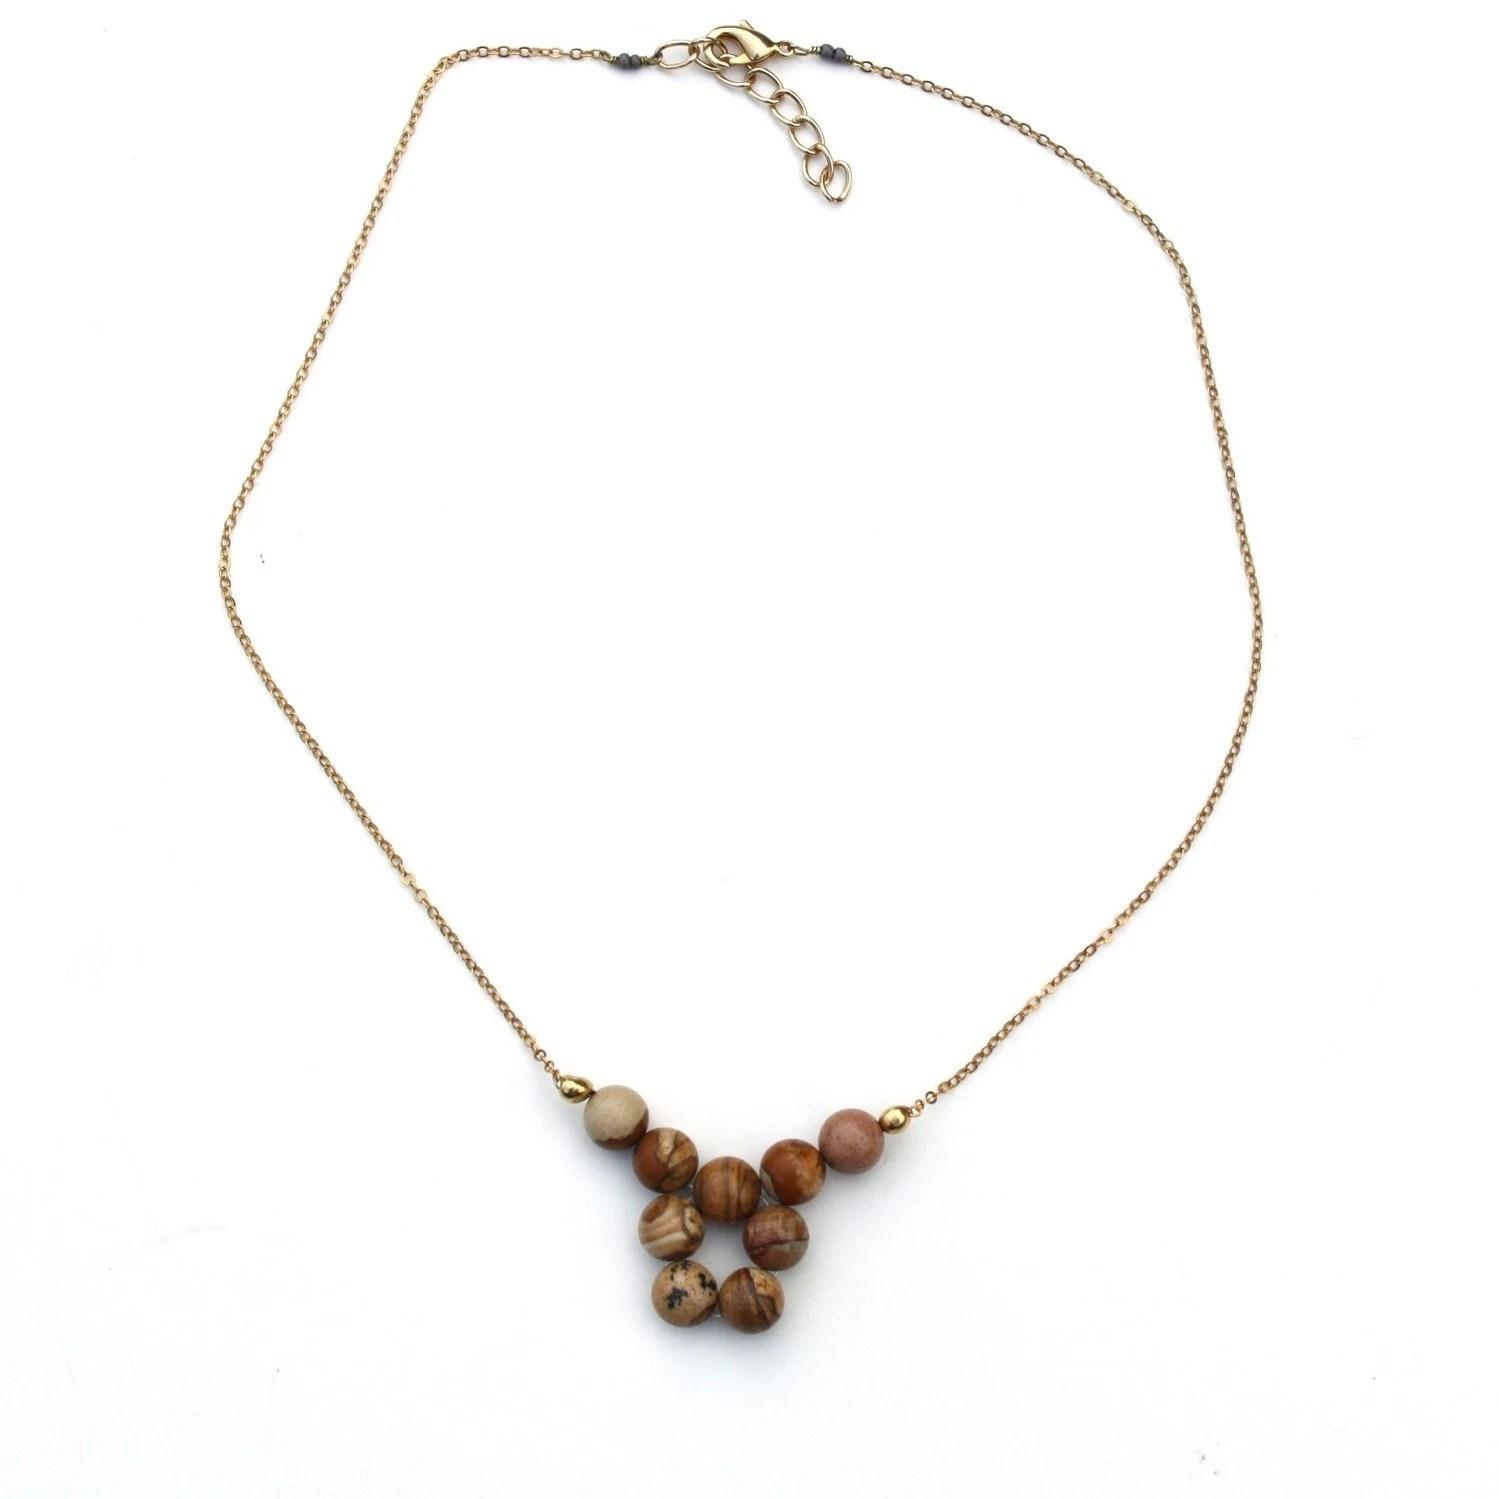 Painted Jasper short 9 stone necklace - designateddryden